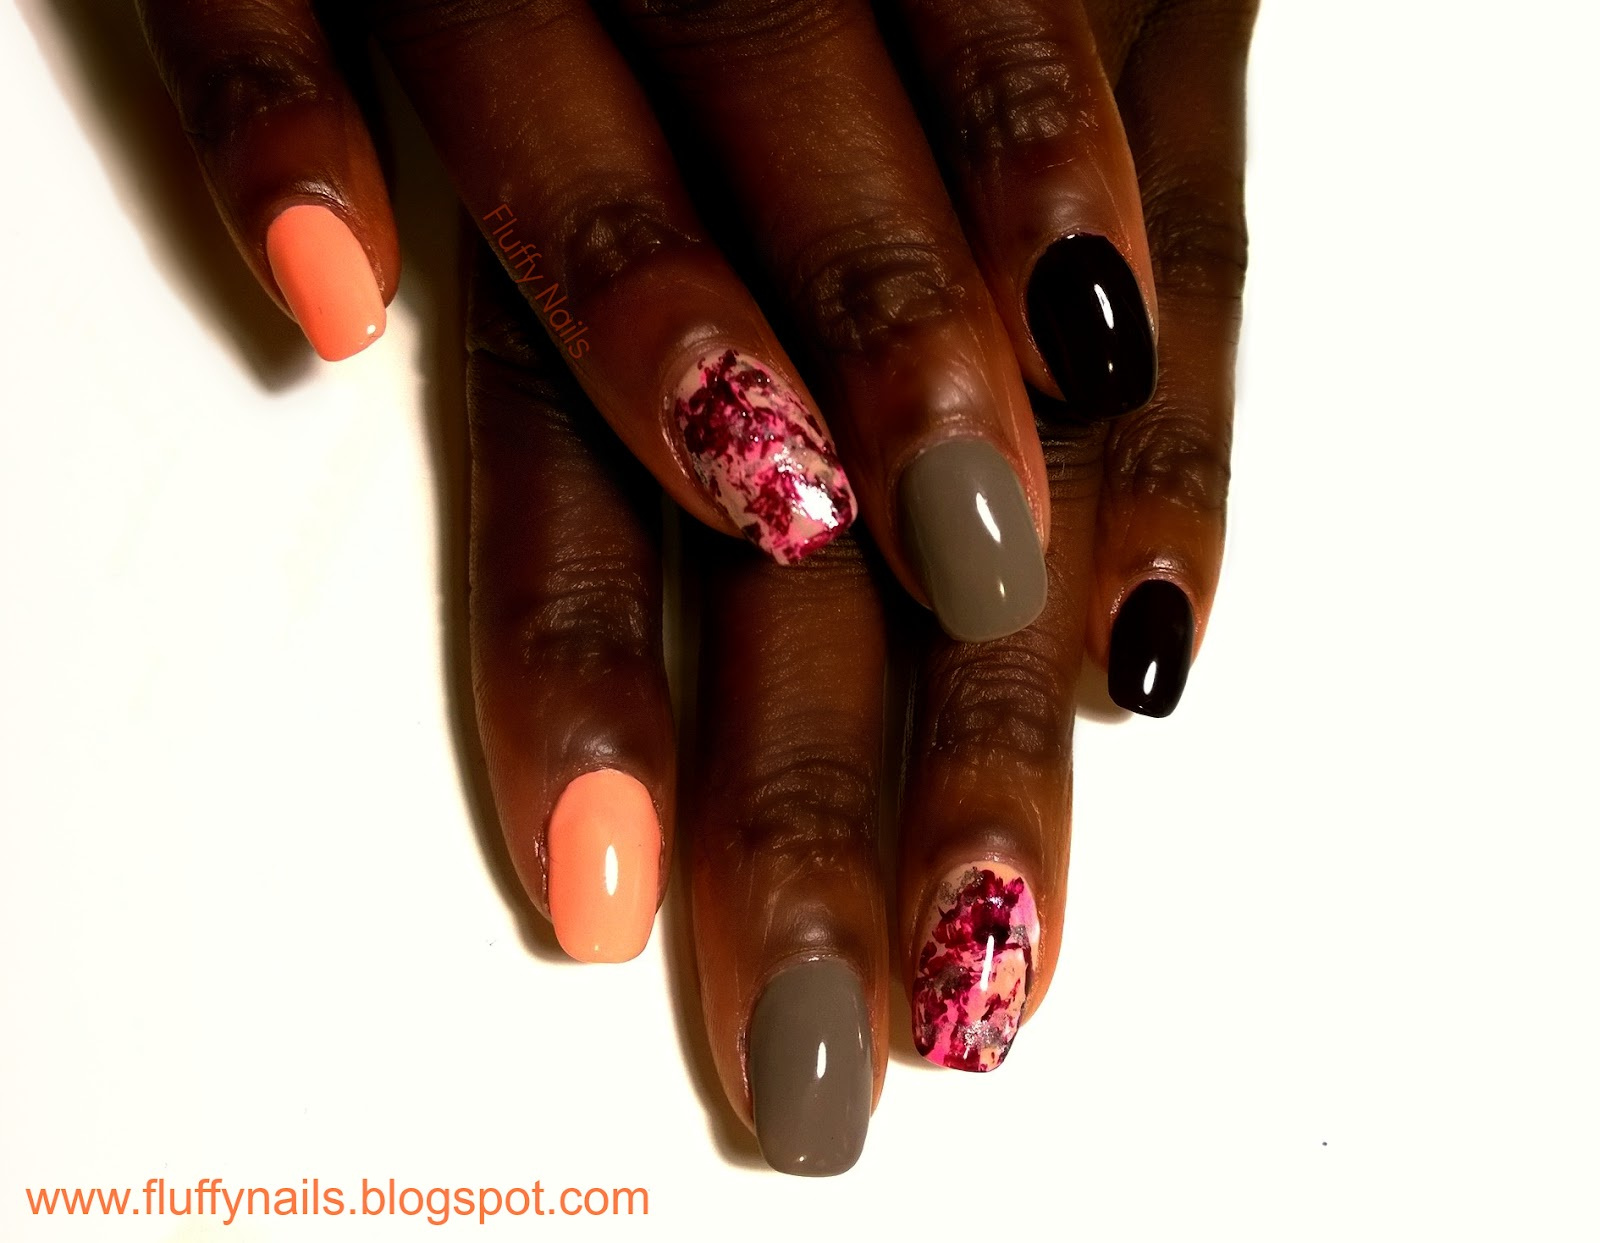 fluffy nails nail art effet marbr sur ines saran wrap manicure. Black Bedroom Furniture Sets. Home Design Ideas